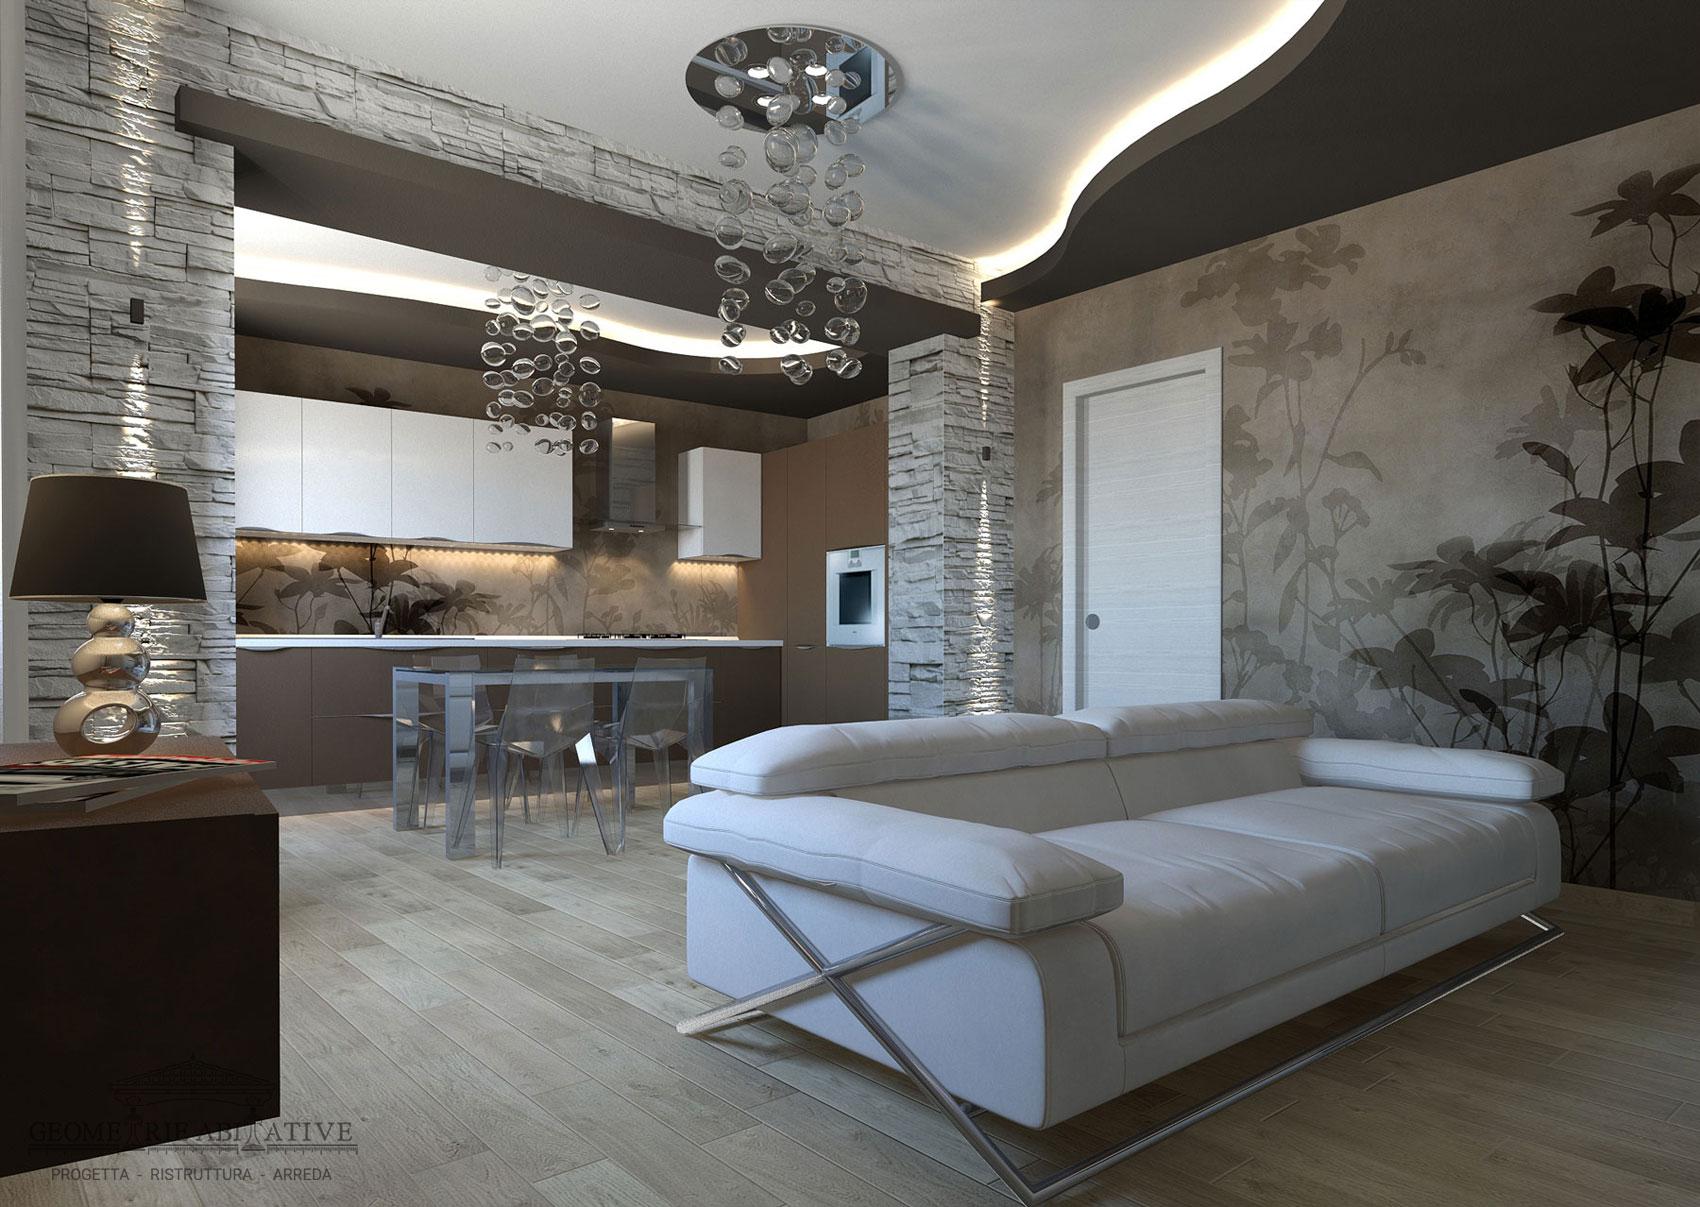 Arredamento Montagna Moderno Idee E Progetti | sokolvineyard.com